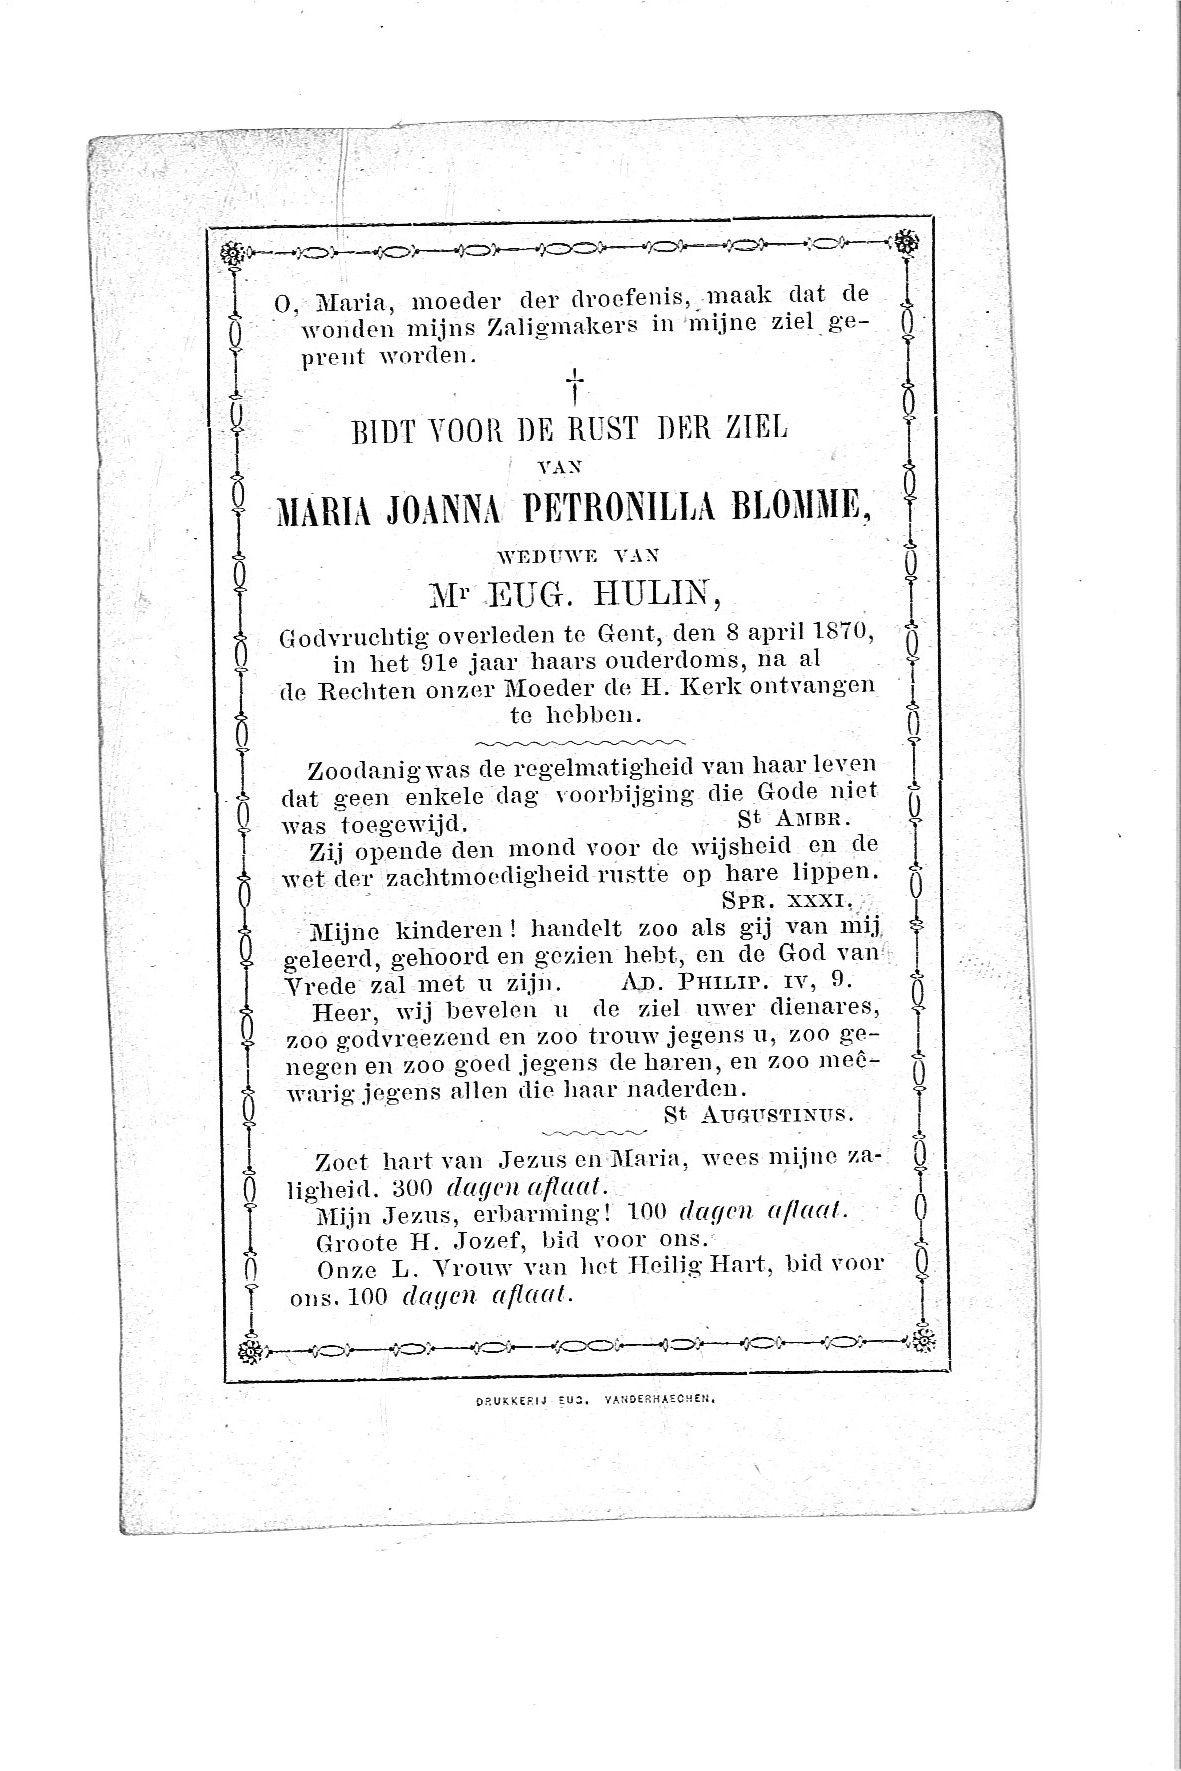 maria-joanna-petronella(1870)20090818093105_00043.jpg